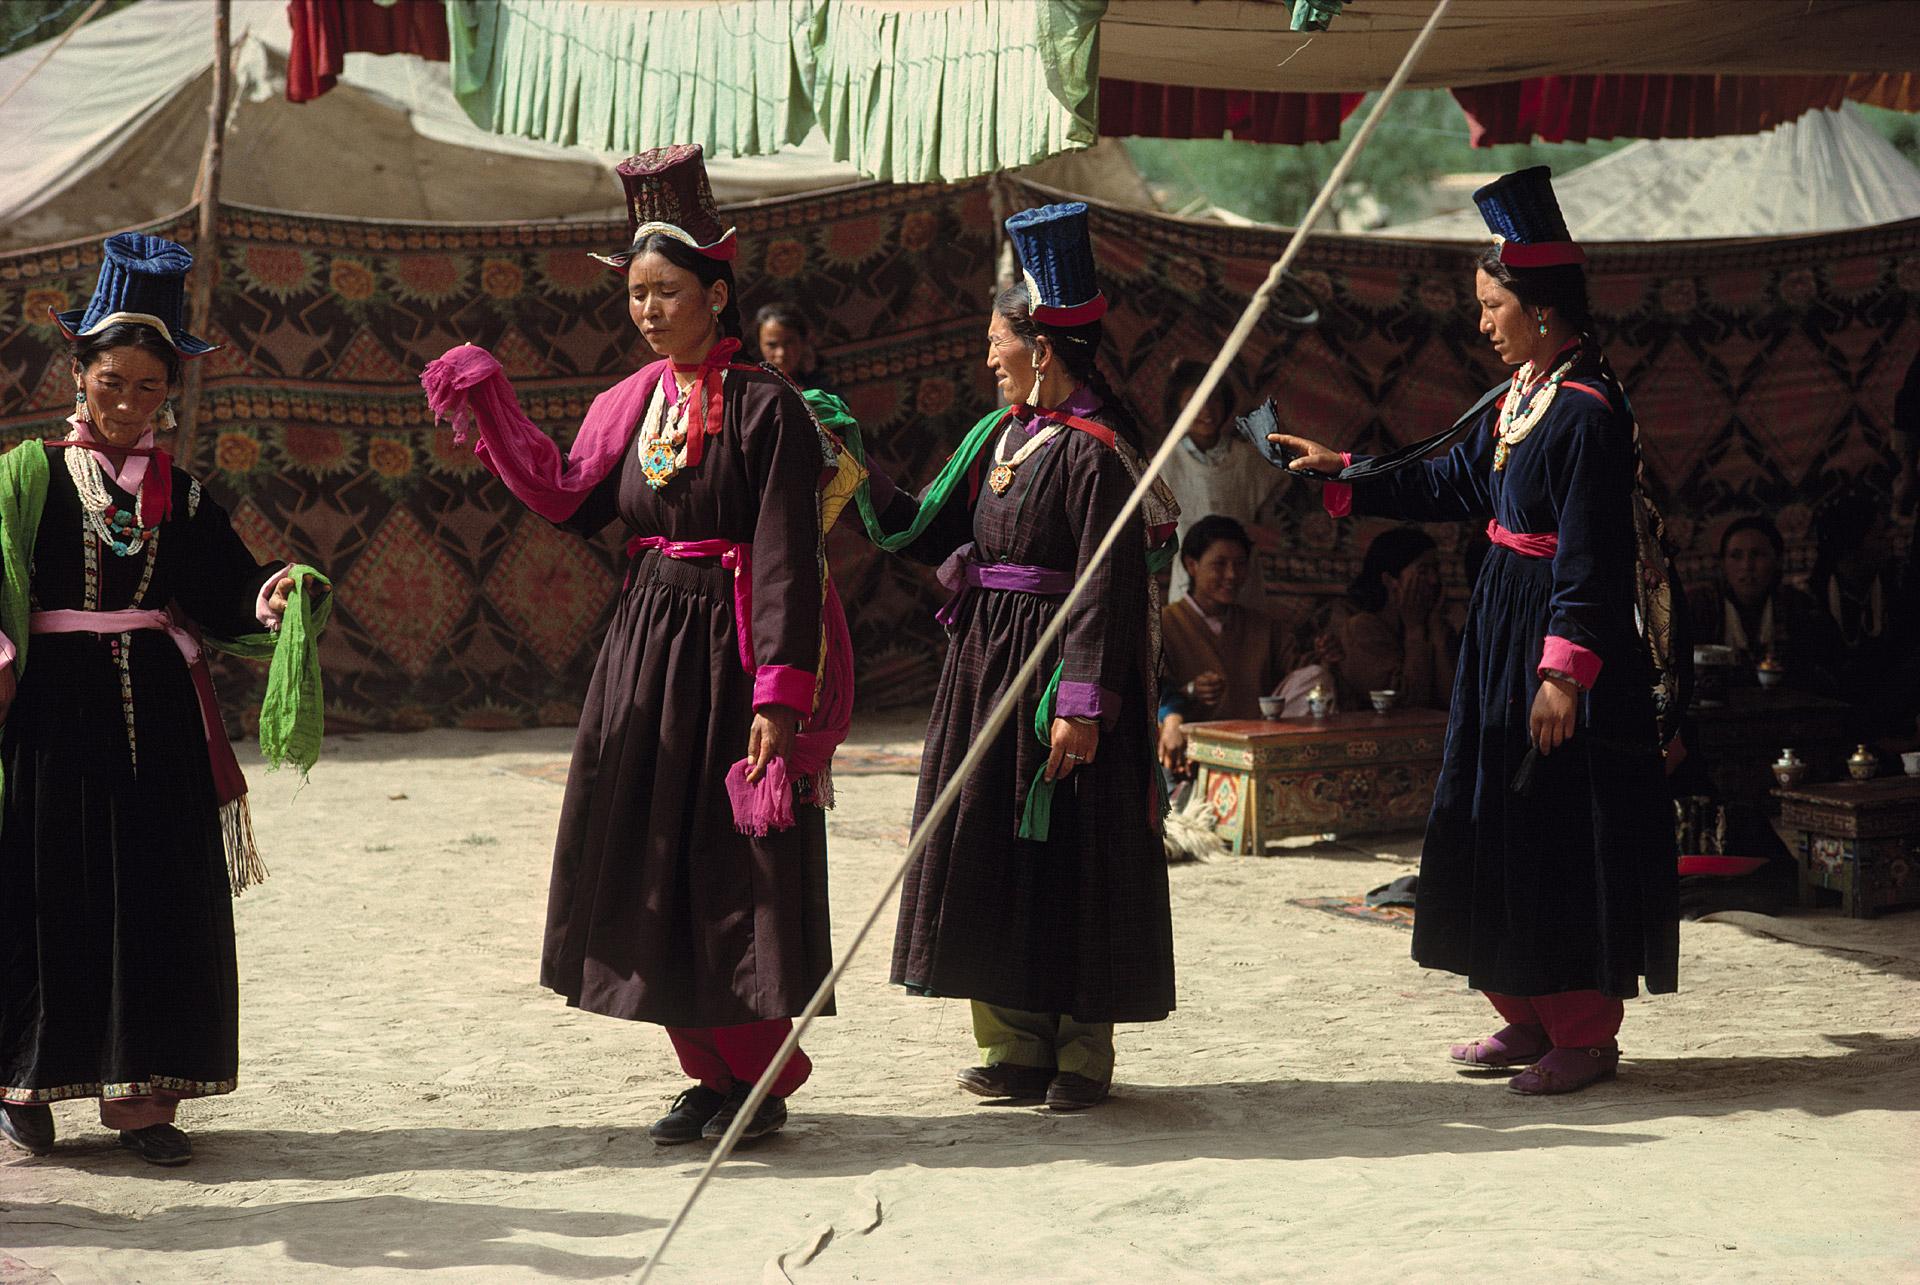 Ladakhian women perform a ceremonial dance near Thiksey Monastery in Ladakh, India